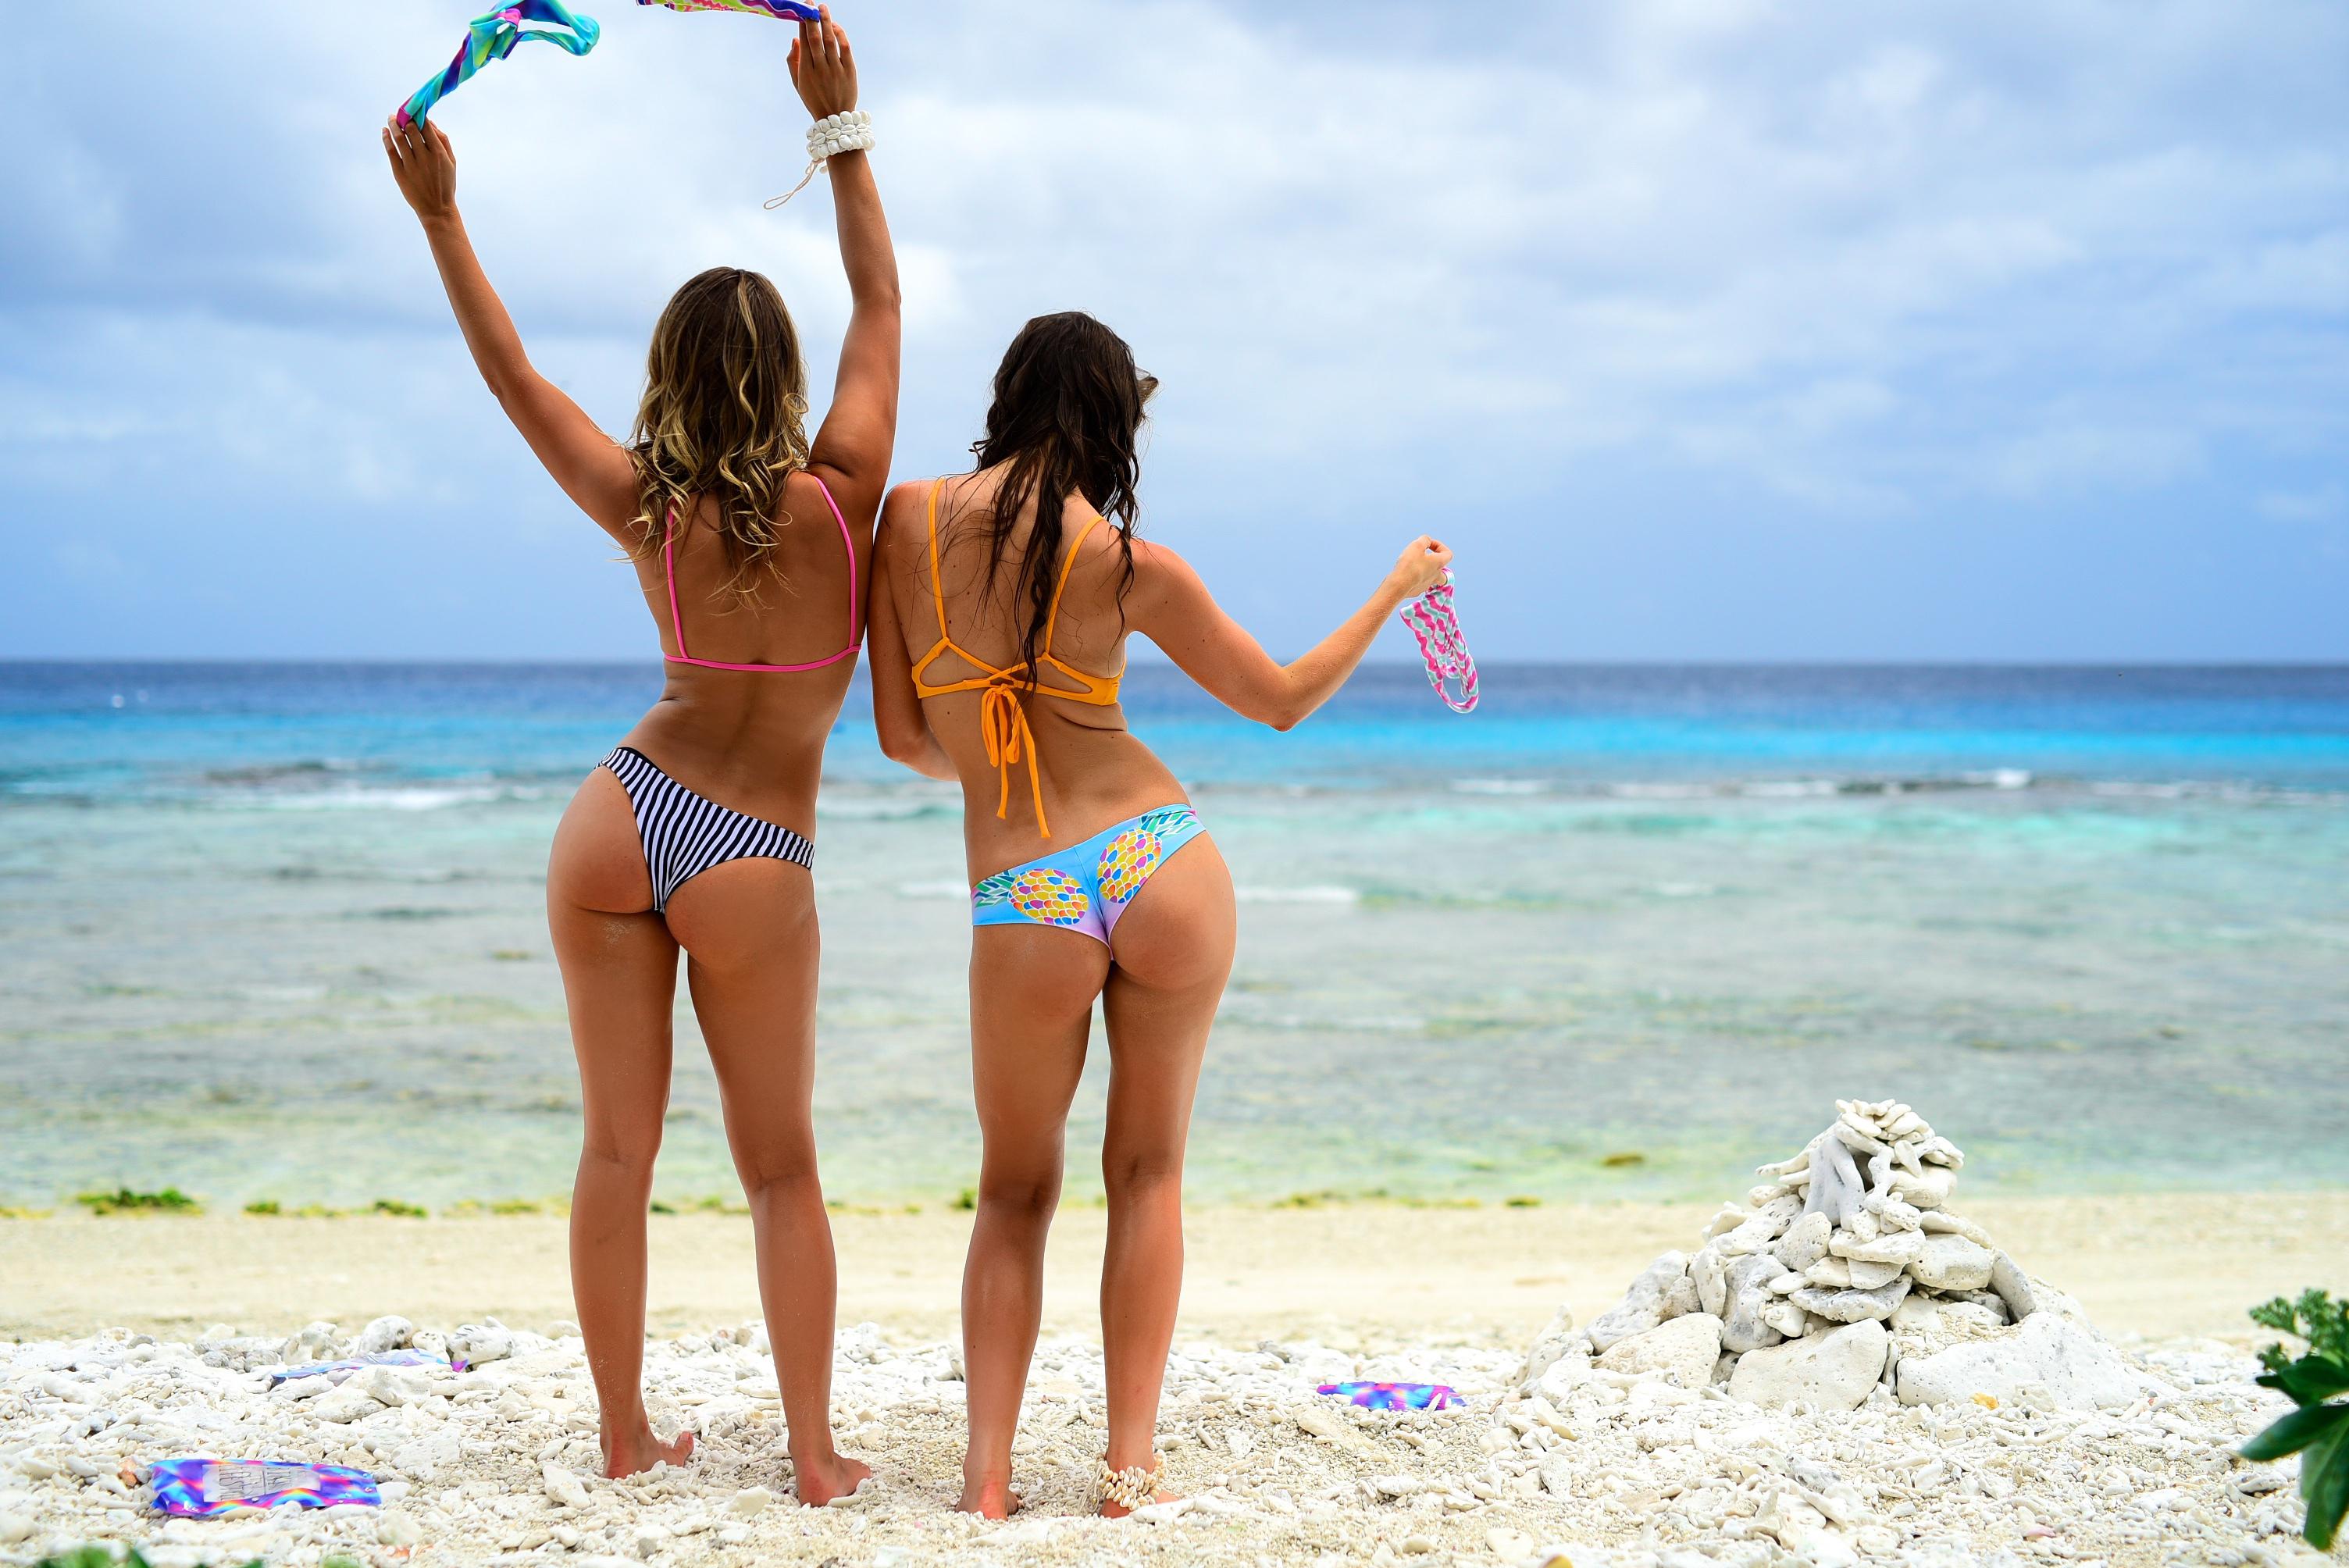 moana bikini discount code № 123113